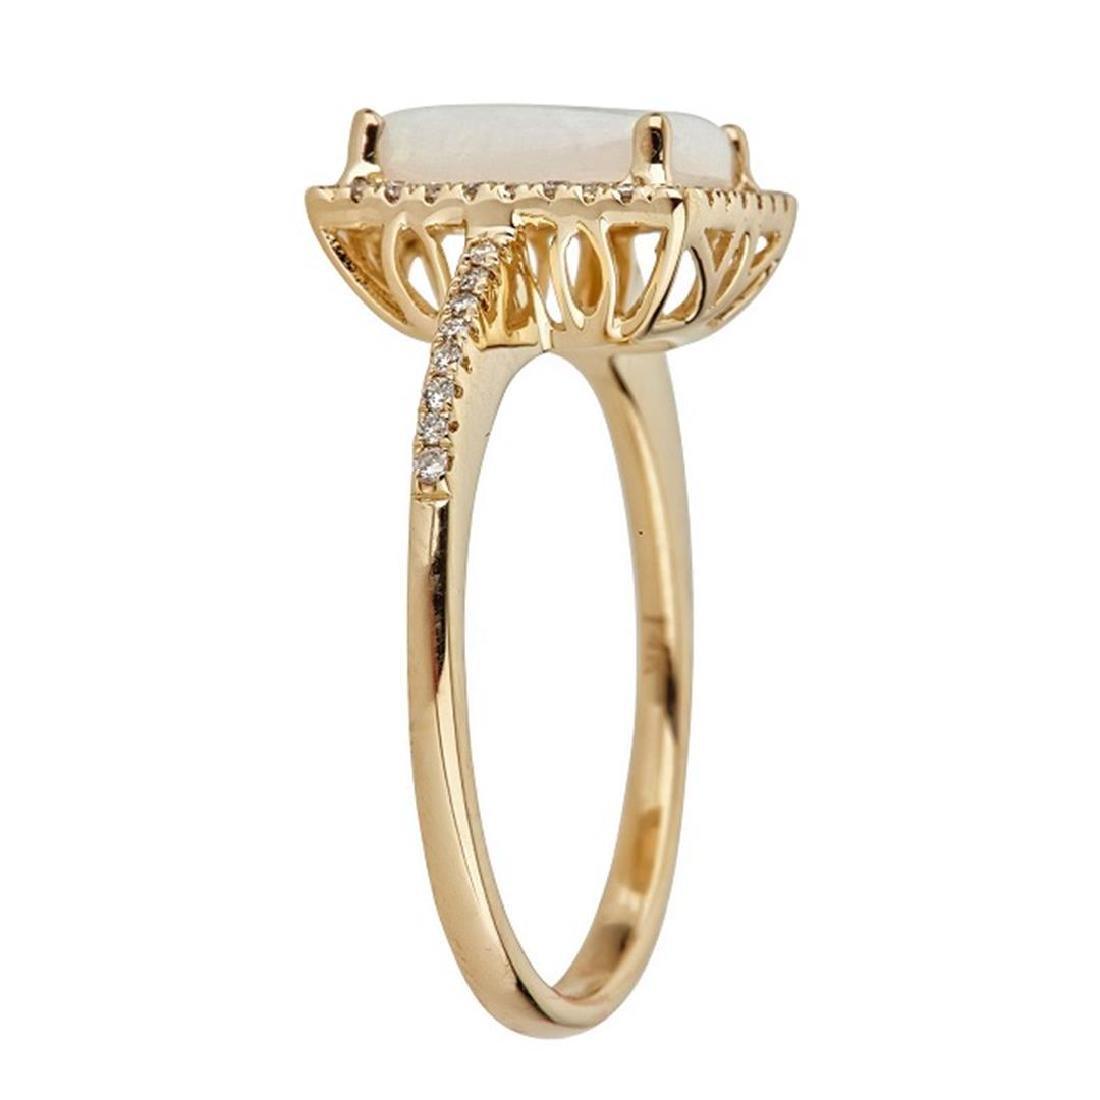 2.03 ctw Aquamarine and Diamond Ring - 14KT White Gold - 2